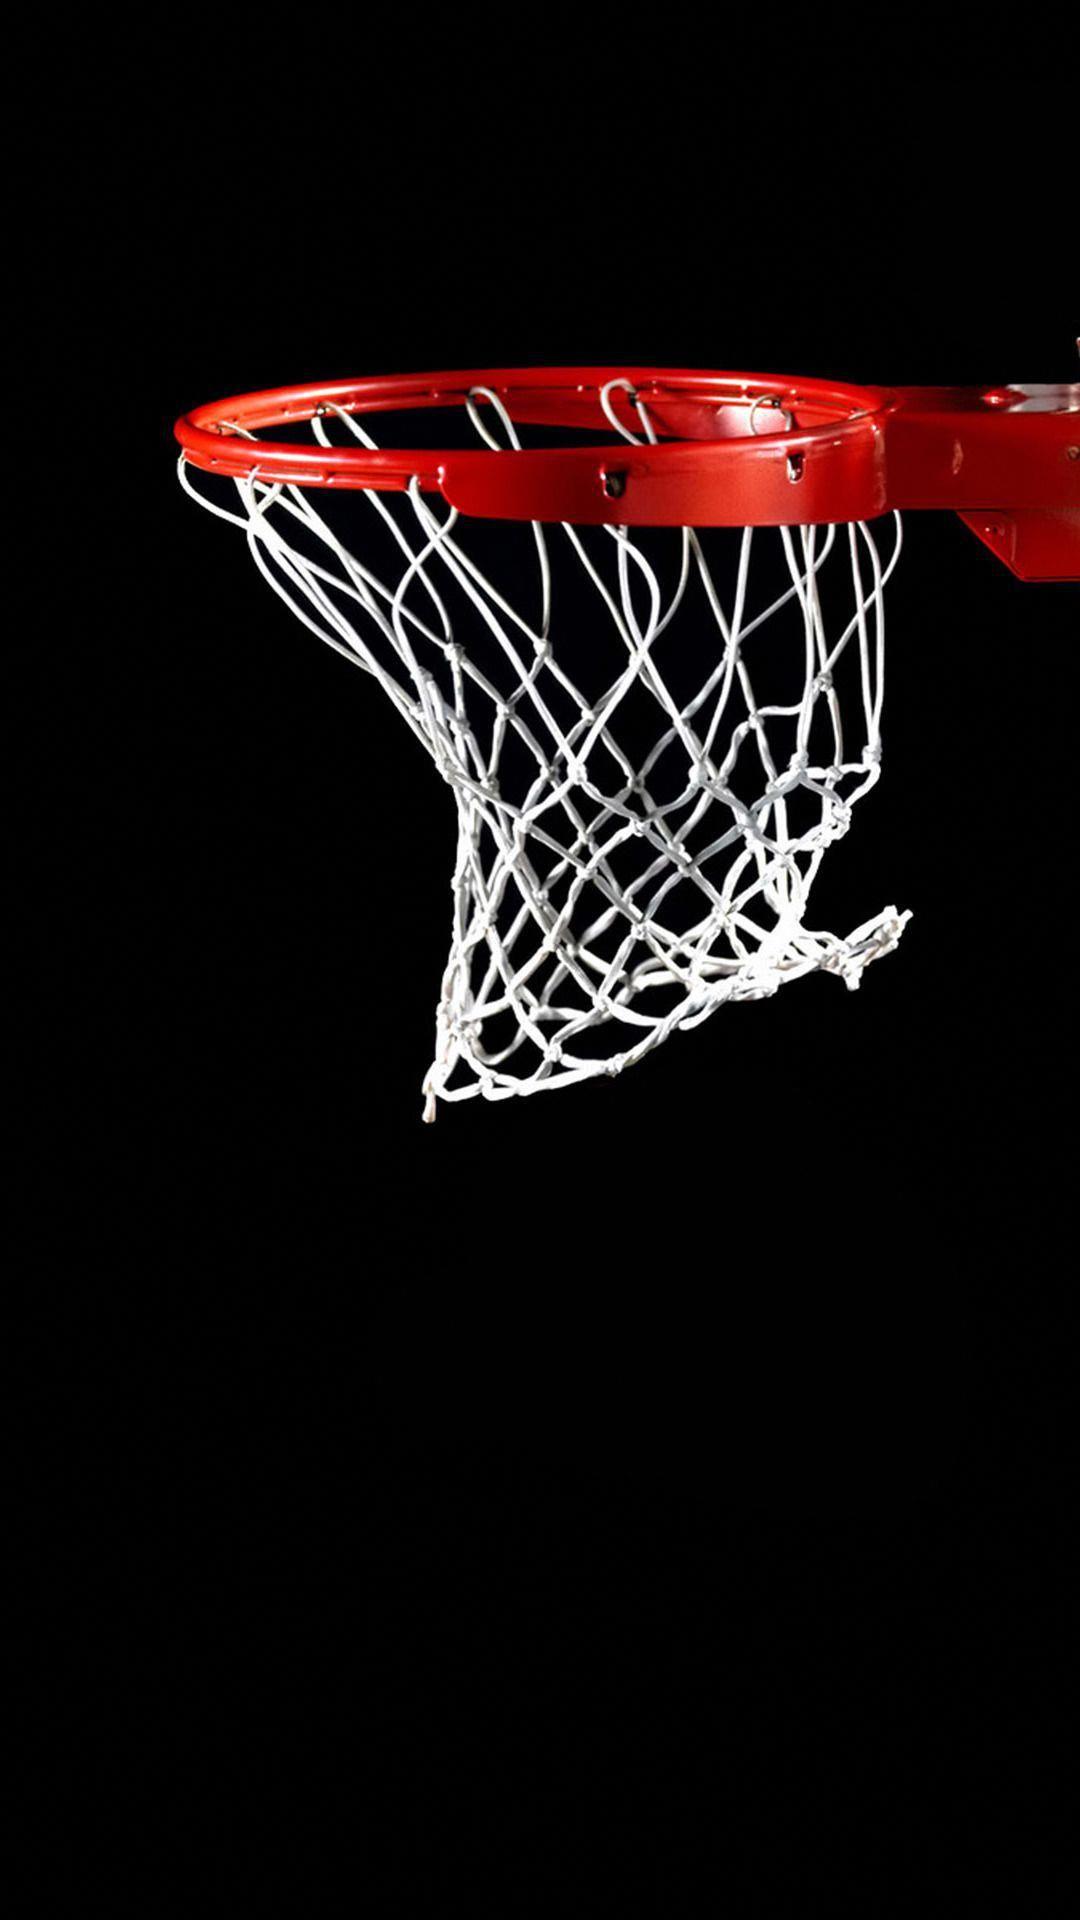 Shoot Basketball Basketry Dark Background Iphone 6 Plus